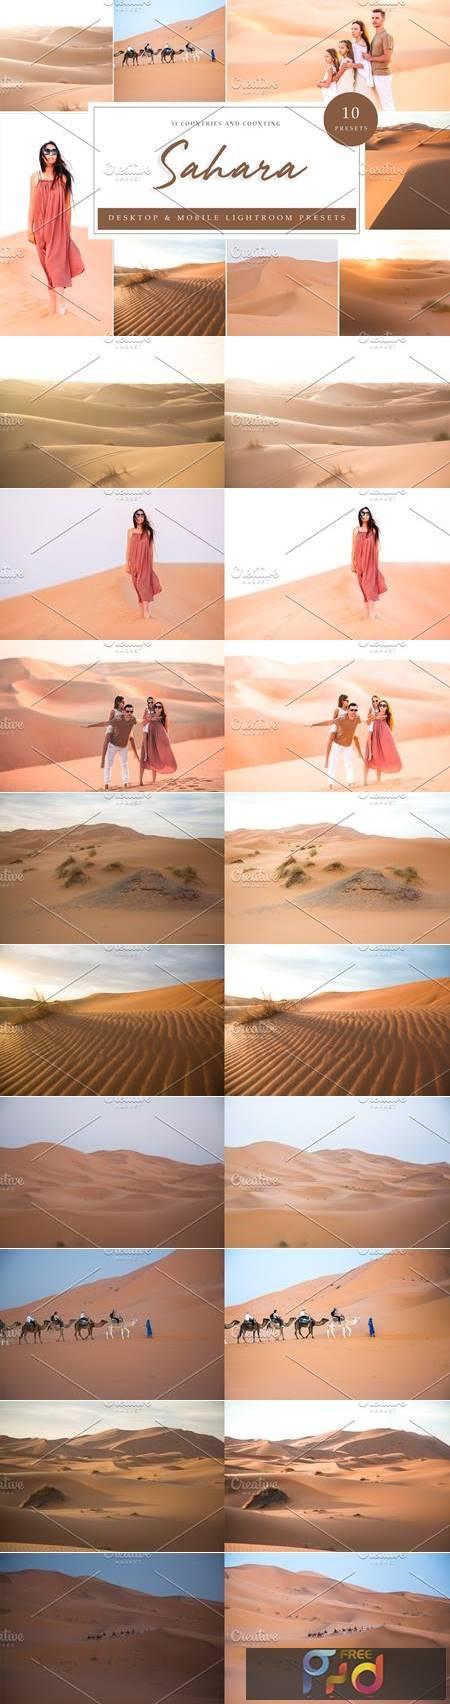 10 Lightroom Presets - Sahara Desert 3918364 1